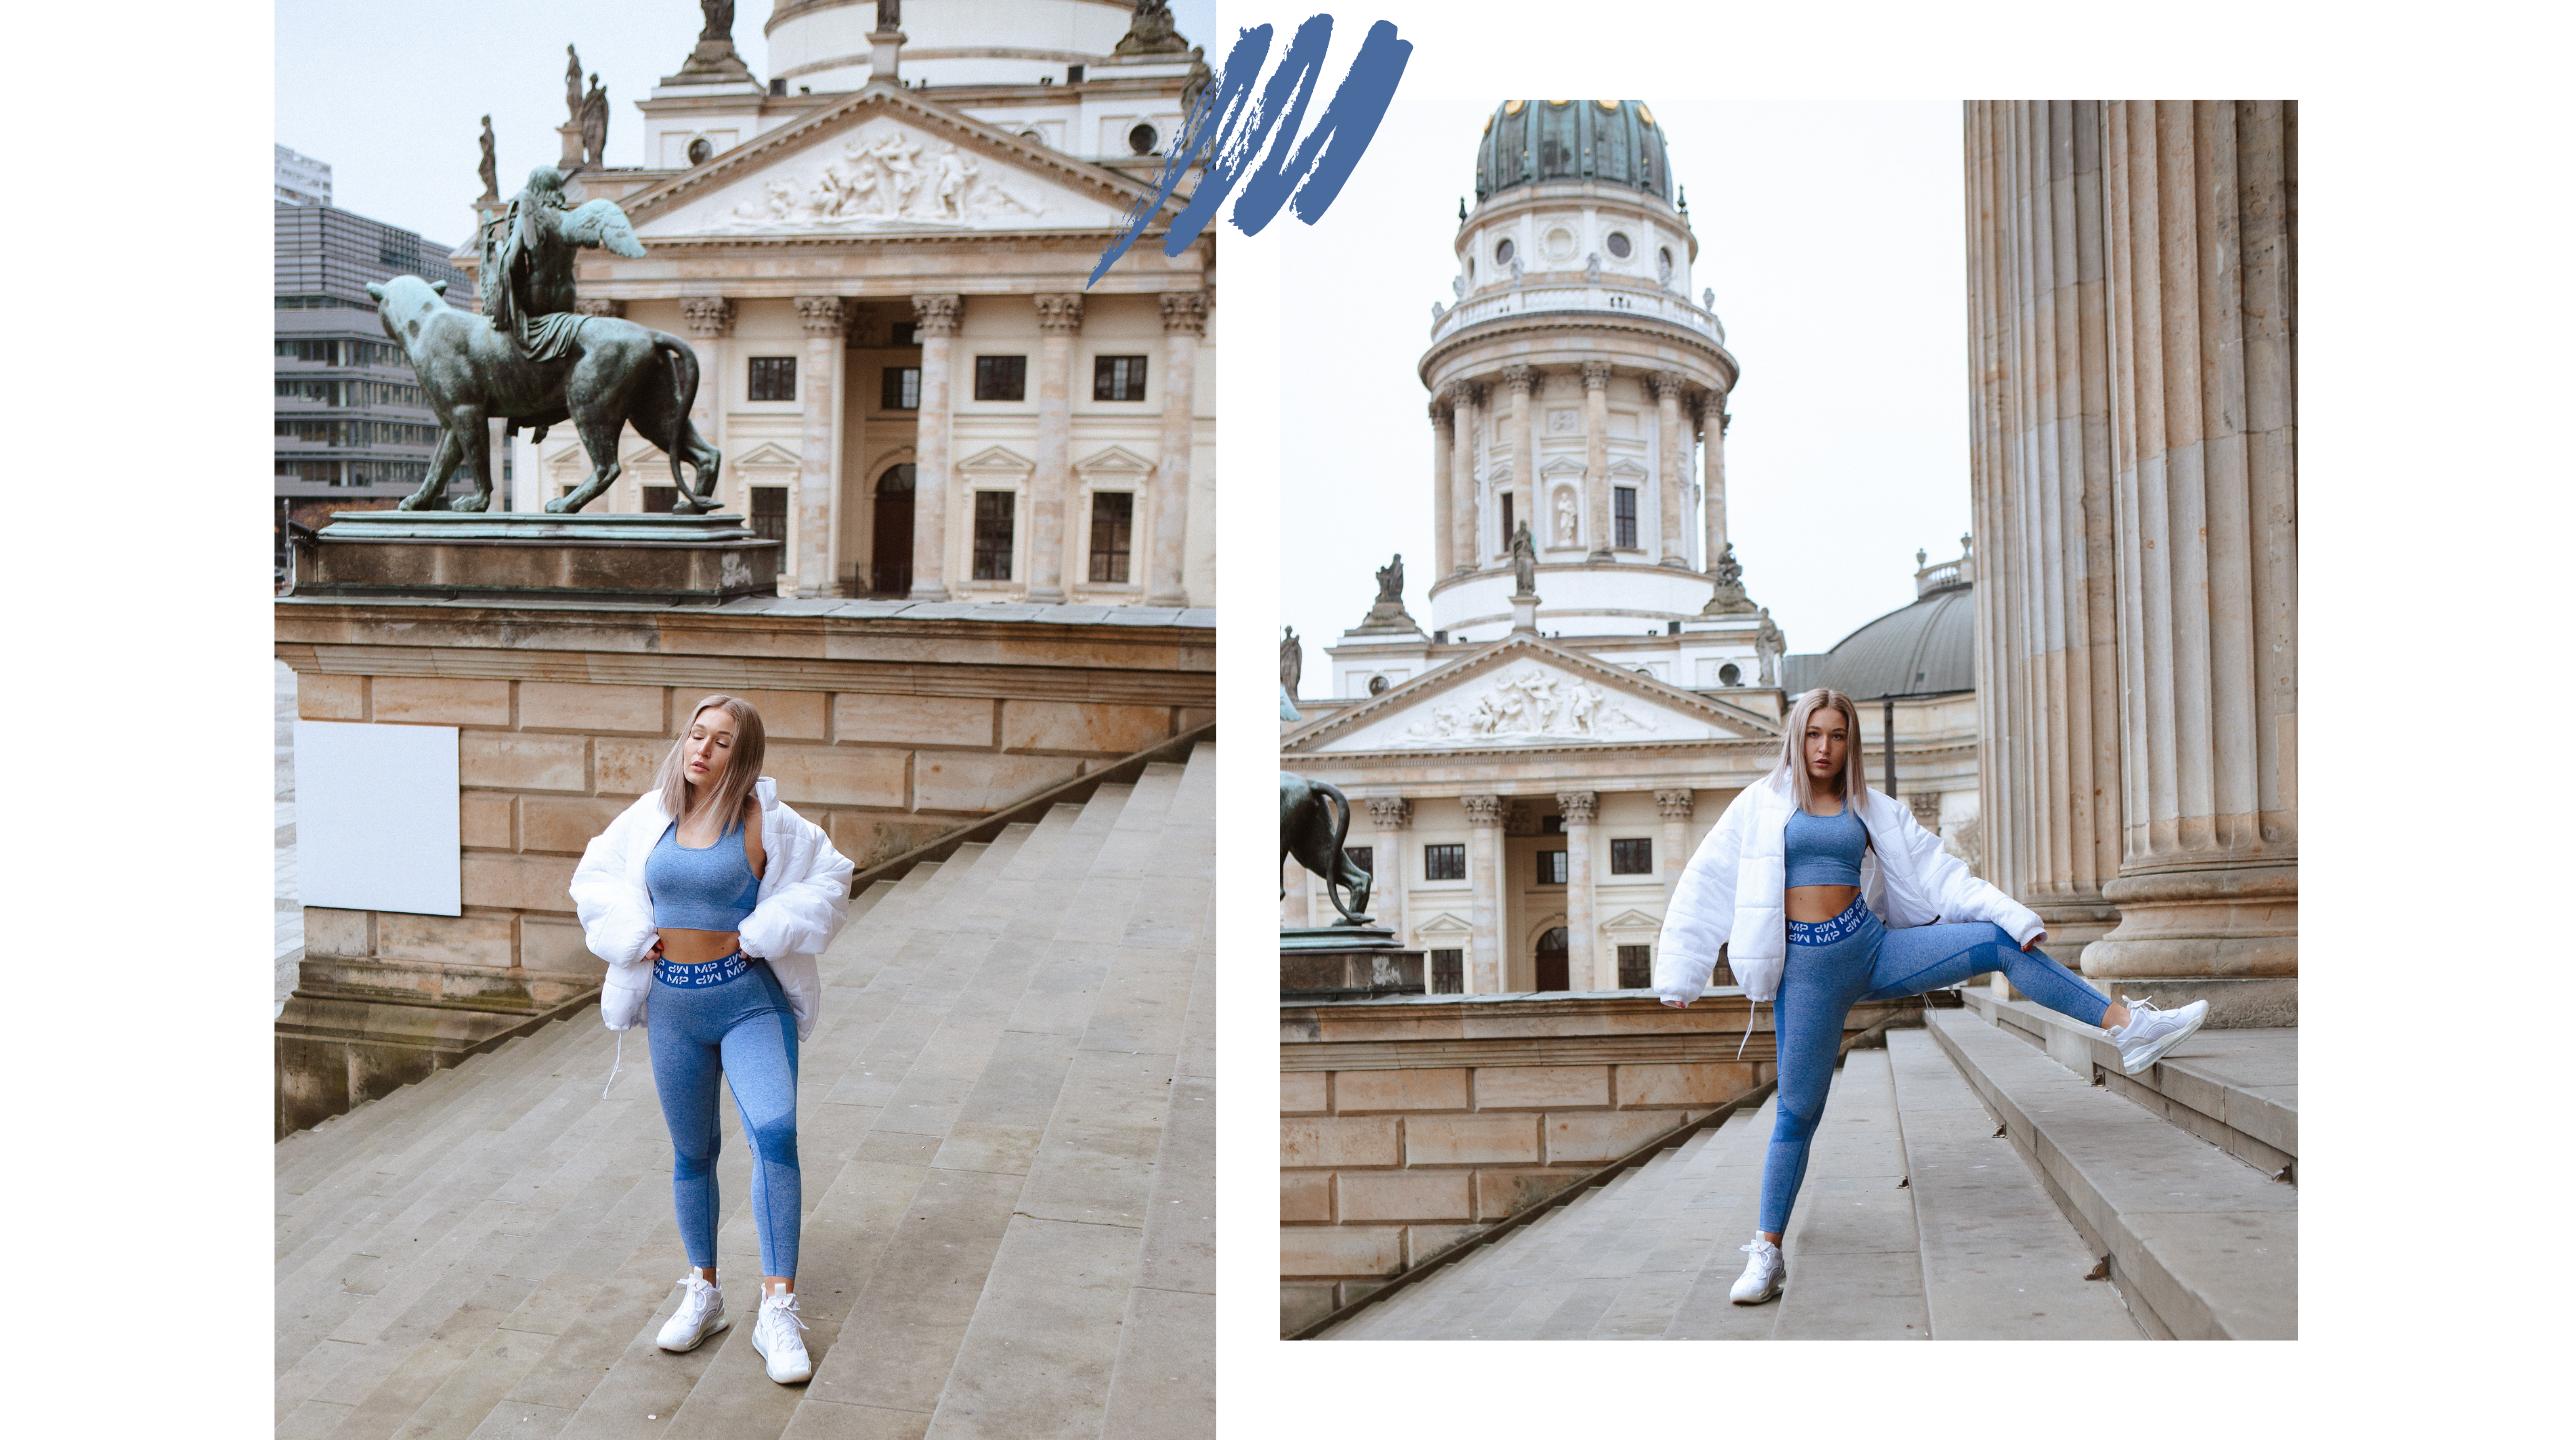 Lauralamode Fitbit Fitbit Blogger Ambassador Fitbit Ambassador 2021 Vorsätze Jahresvorsätze Berlin Fitnessblogger Lifestyleblogger